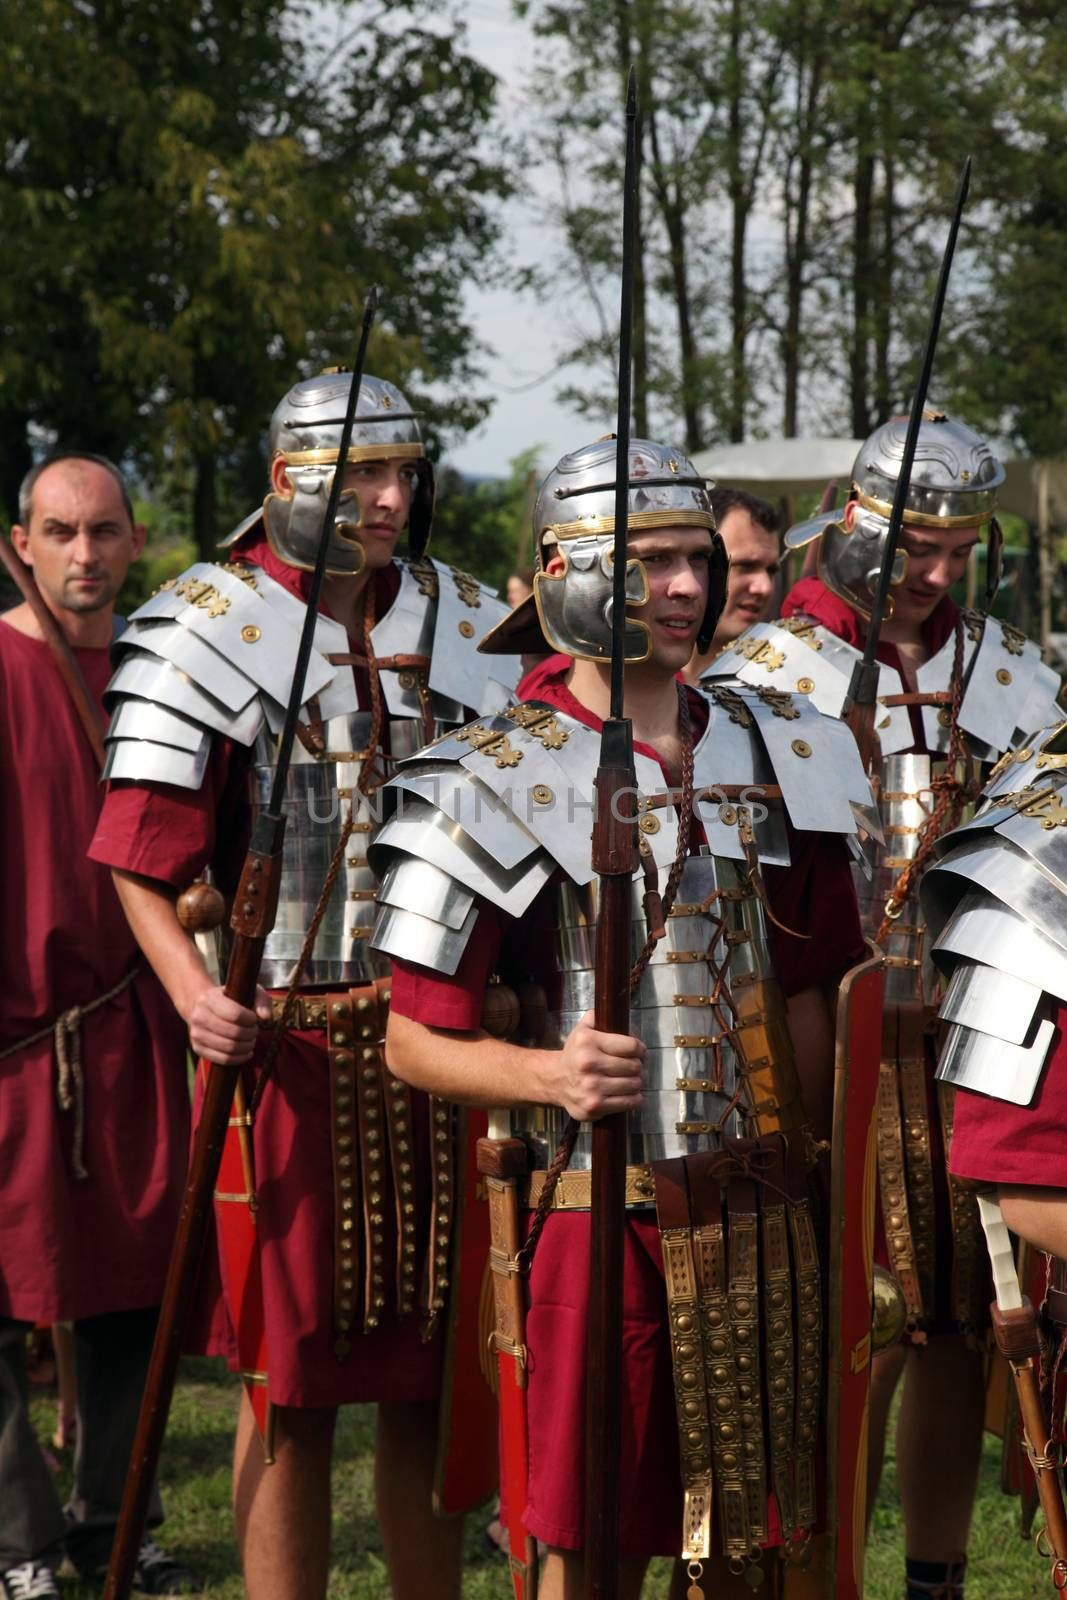 Dionysus festivities in Andautonija, ancient Roman settlement near Zagreb on Sep 15, 2013 in Zagreb, Croatia.